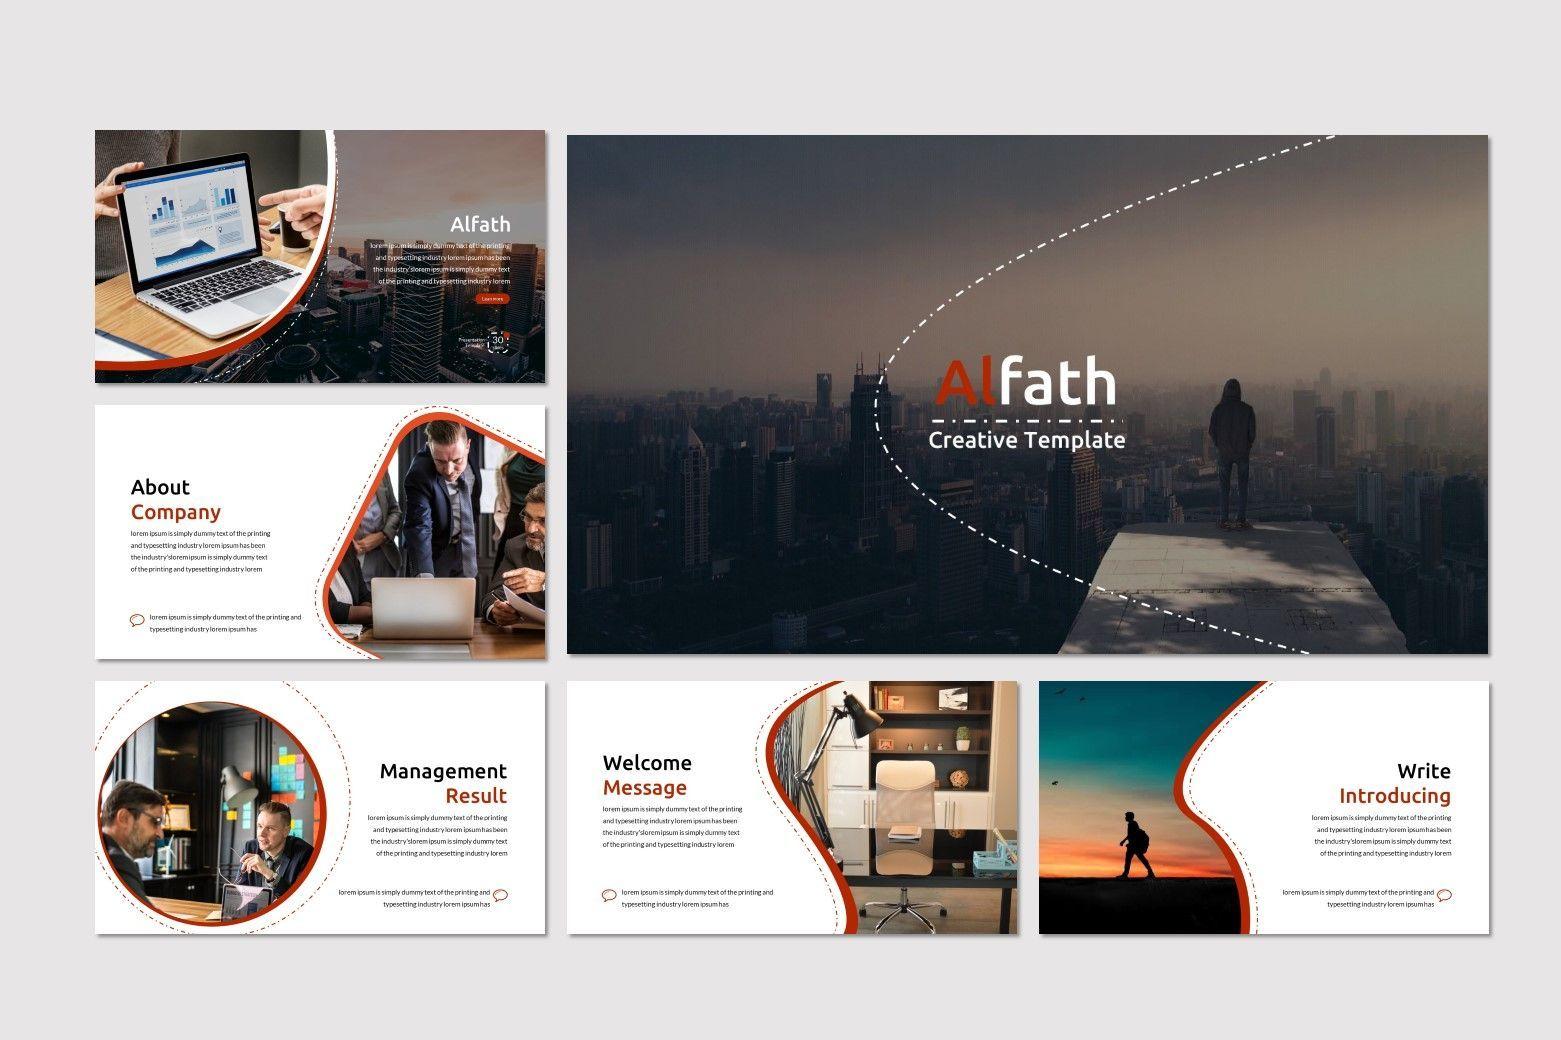 Alfath - PowerPoint Template, Slide 2, 07592, Presentation Templates — PoweredTemplate.com